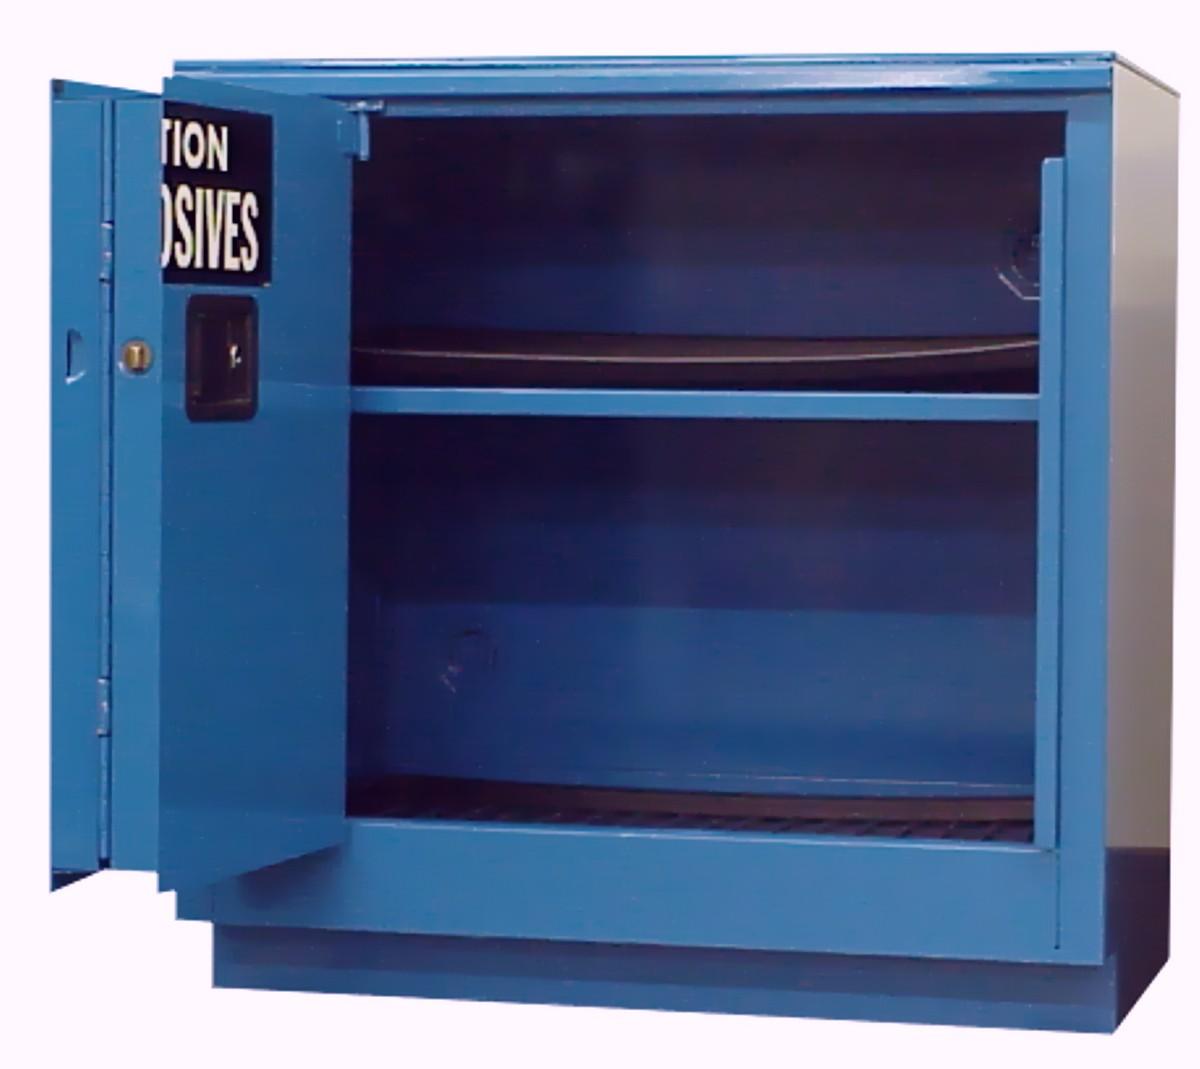 C224 Acid/Corrosive Storage Cabinet - 24 Gal. Storage Capacity